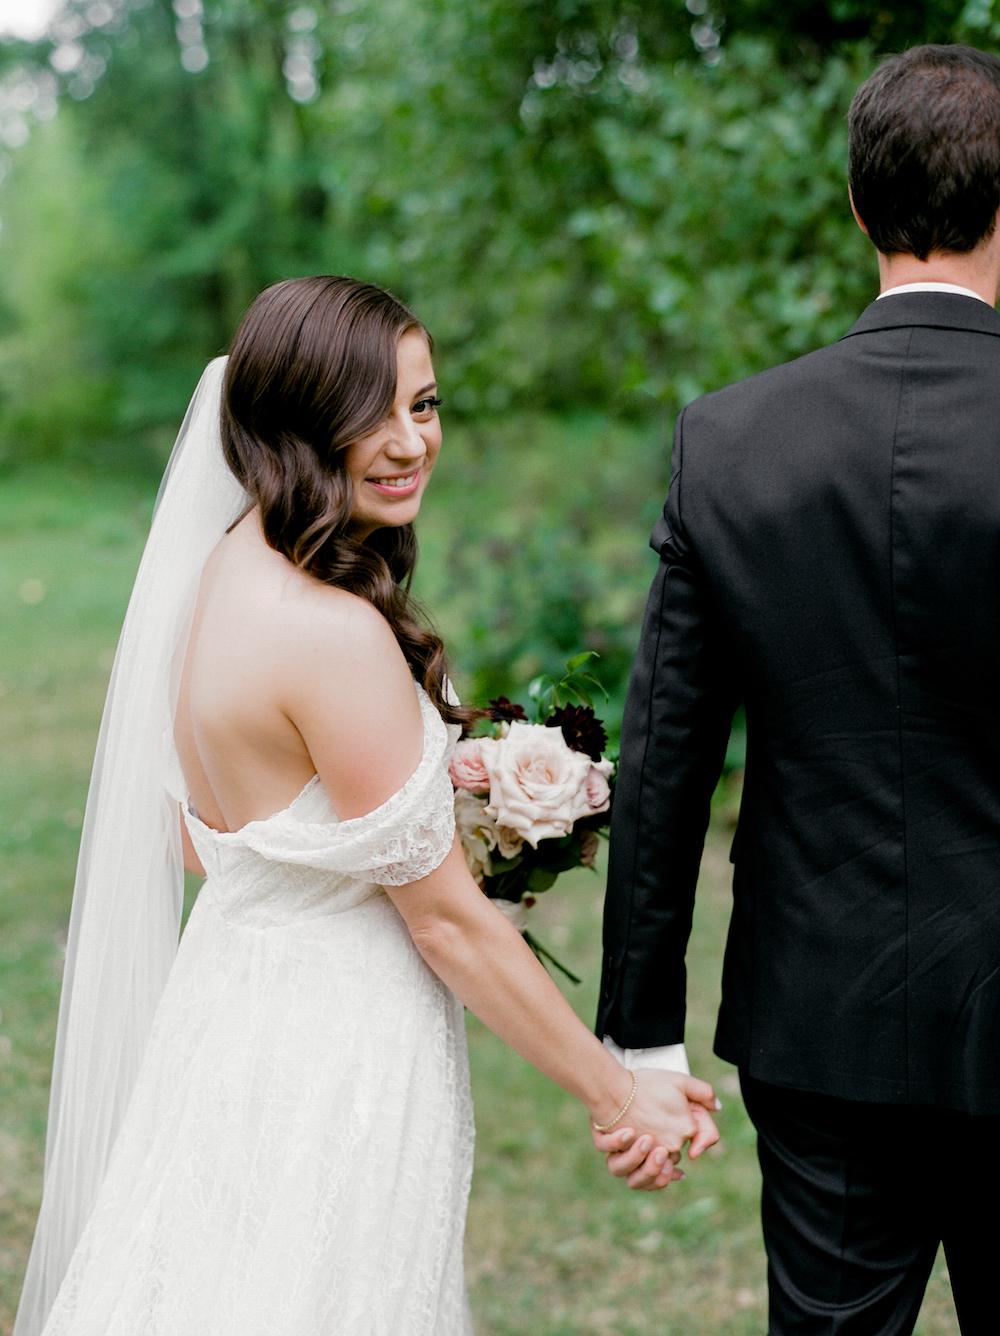 Outdoor Wedding Photos - Wedding Photographers Winnipeg